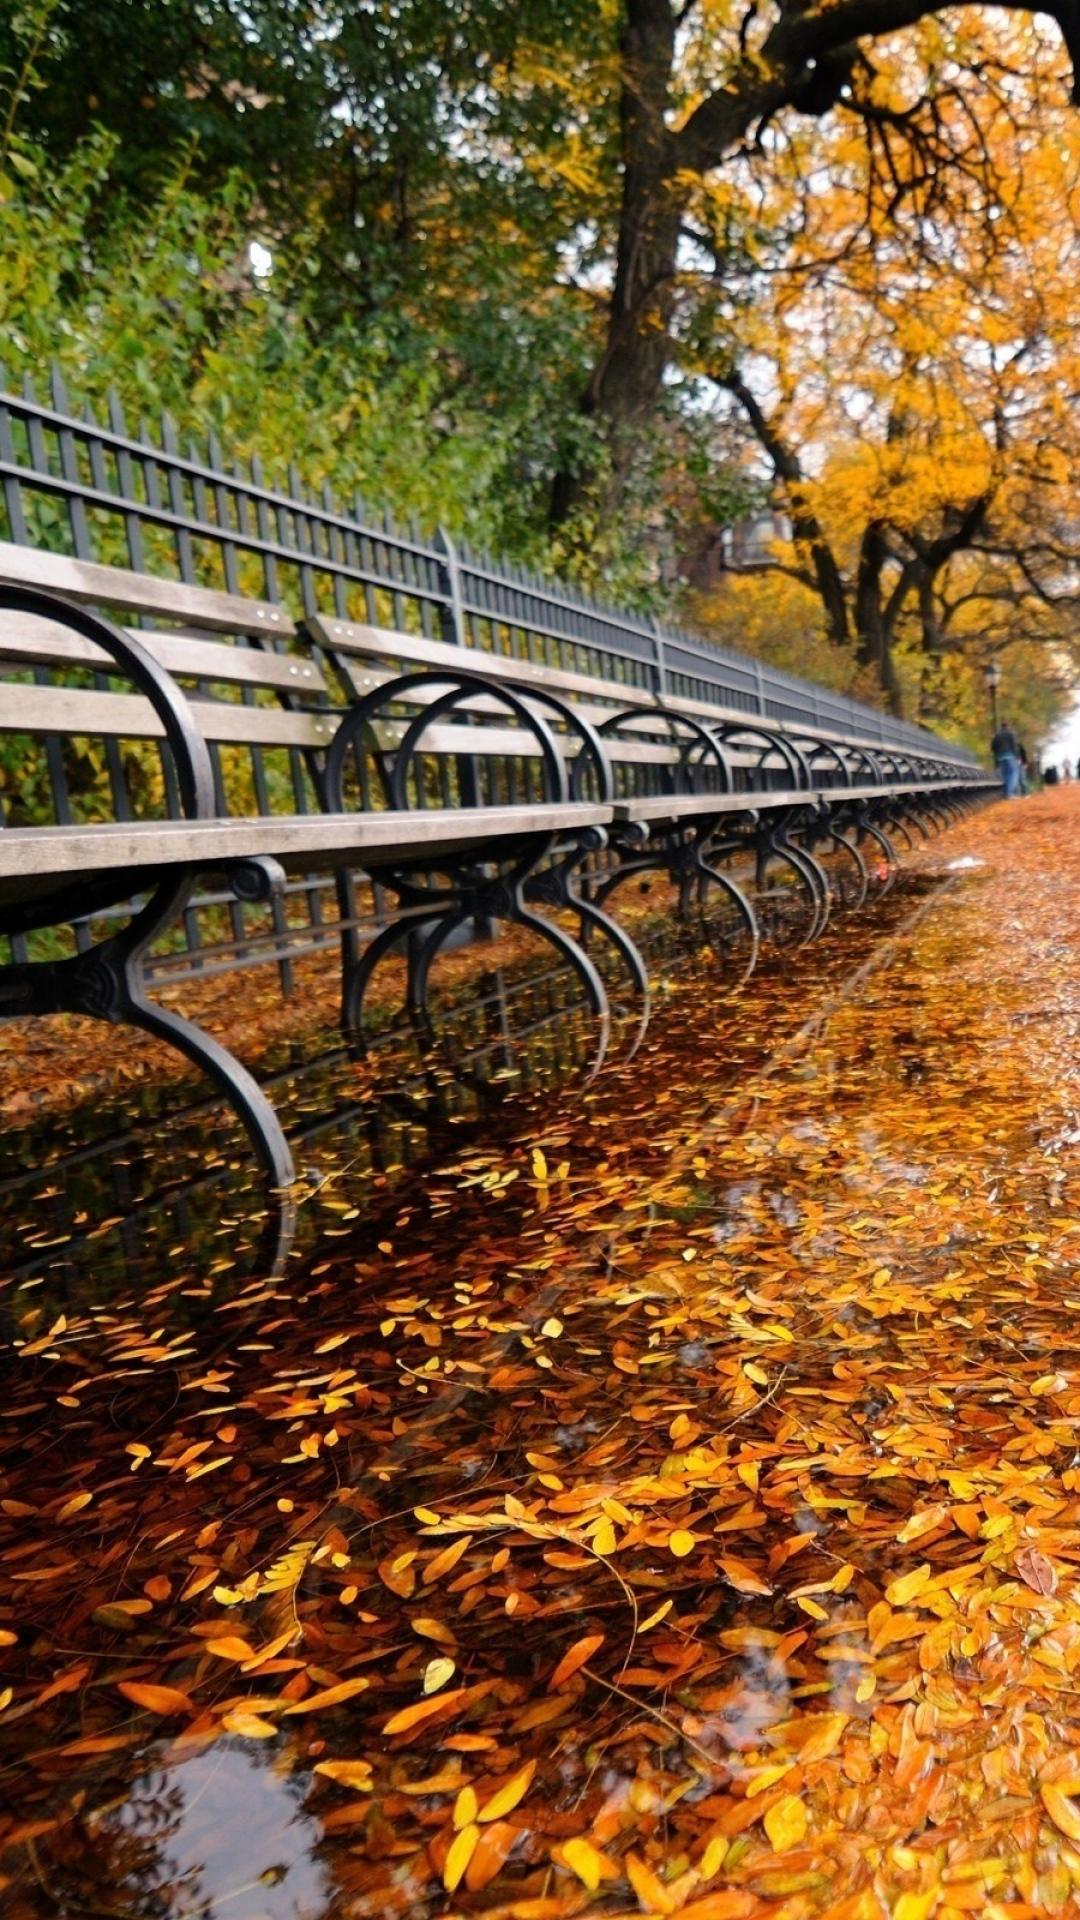 Fall Iphone Wallpaper 254590 Autumn In New York Desktop